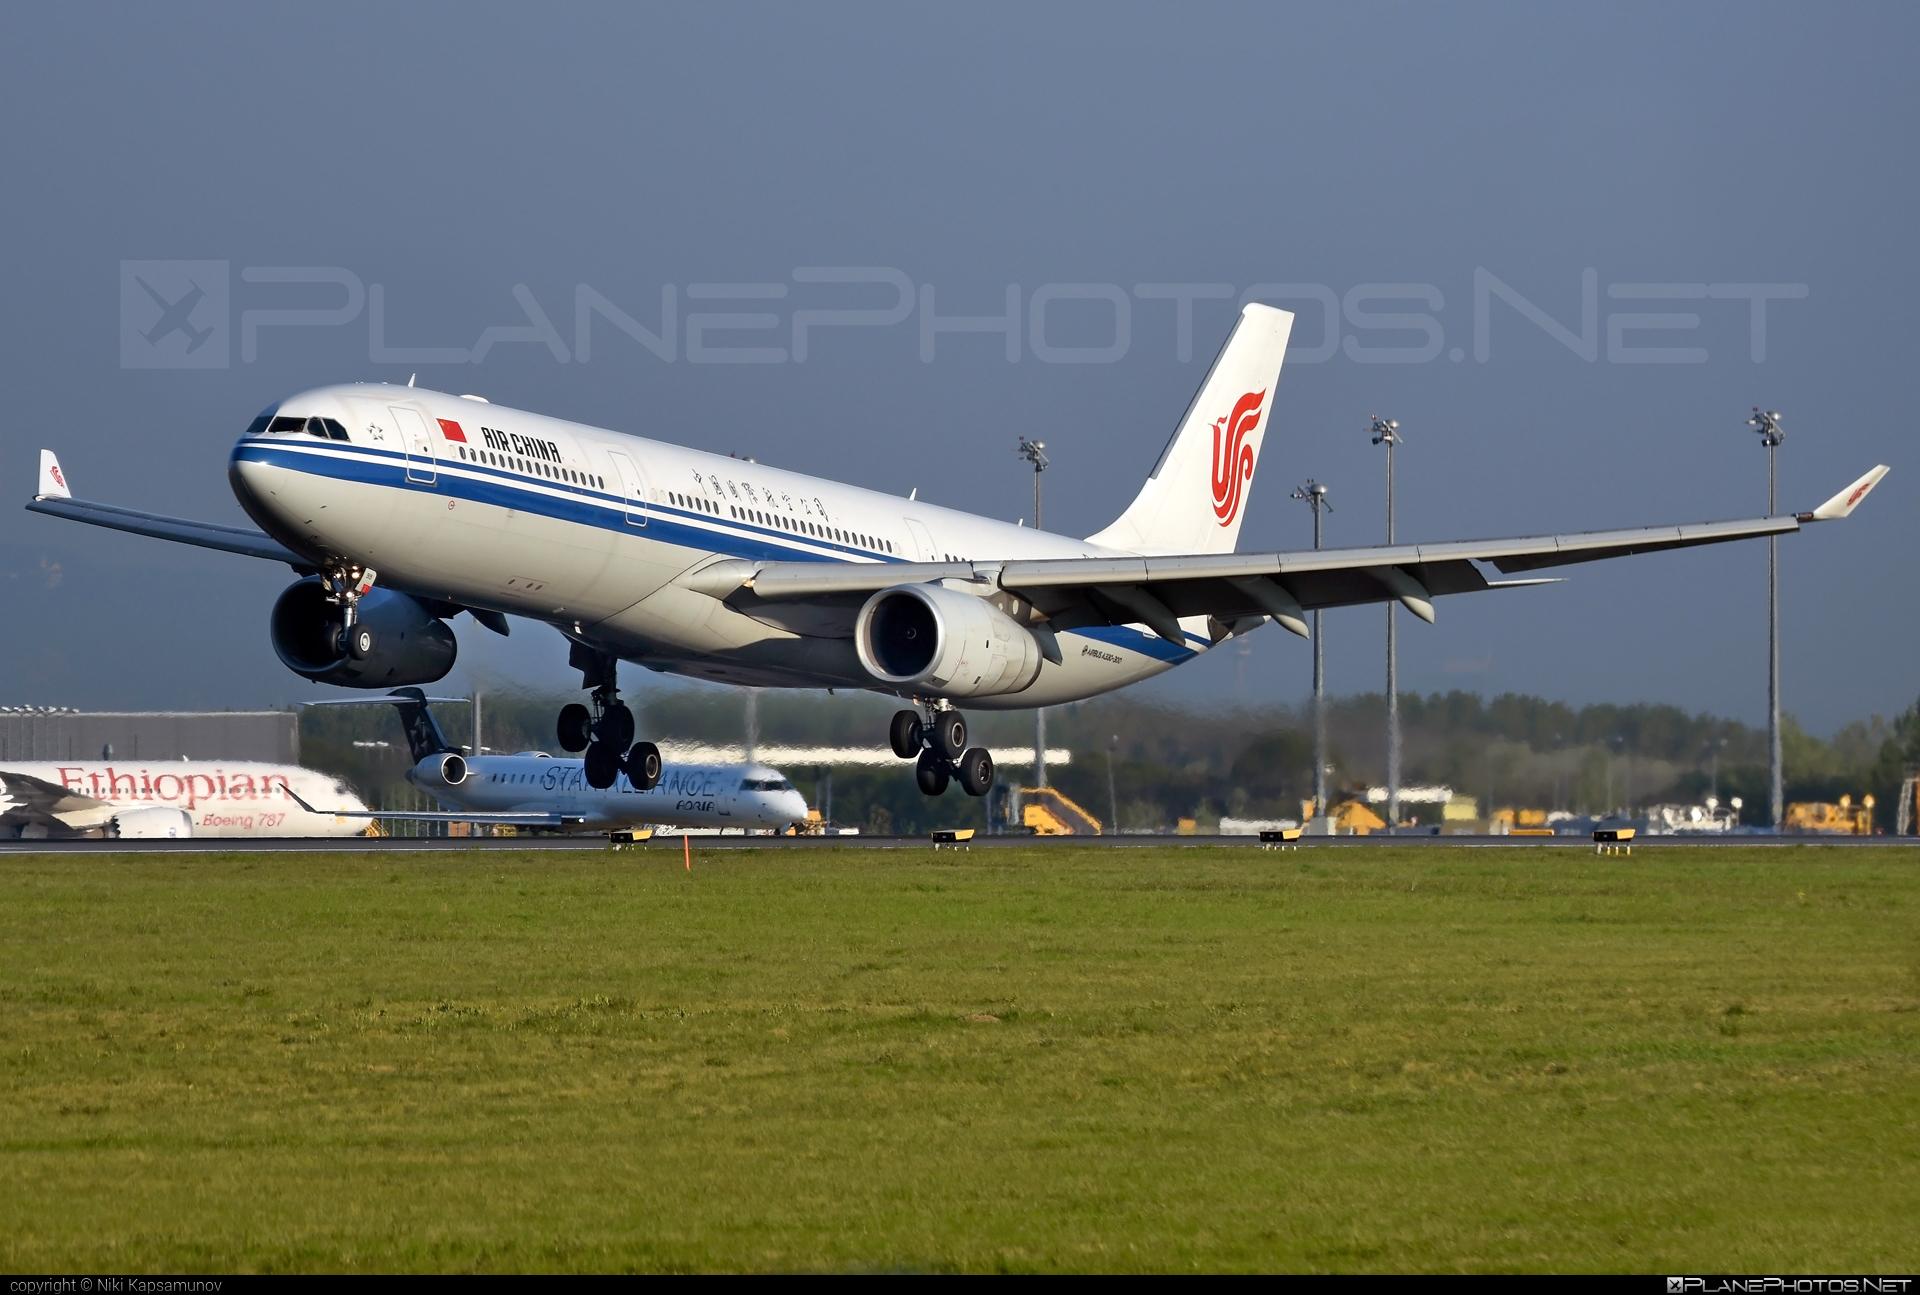 Airbus A330-343 - B-5919 operated by Air China #a330 #a330family #airbus #airbus330 #airchina